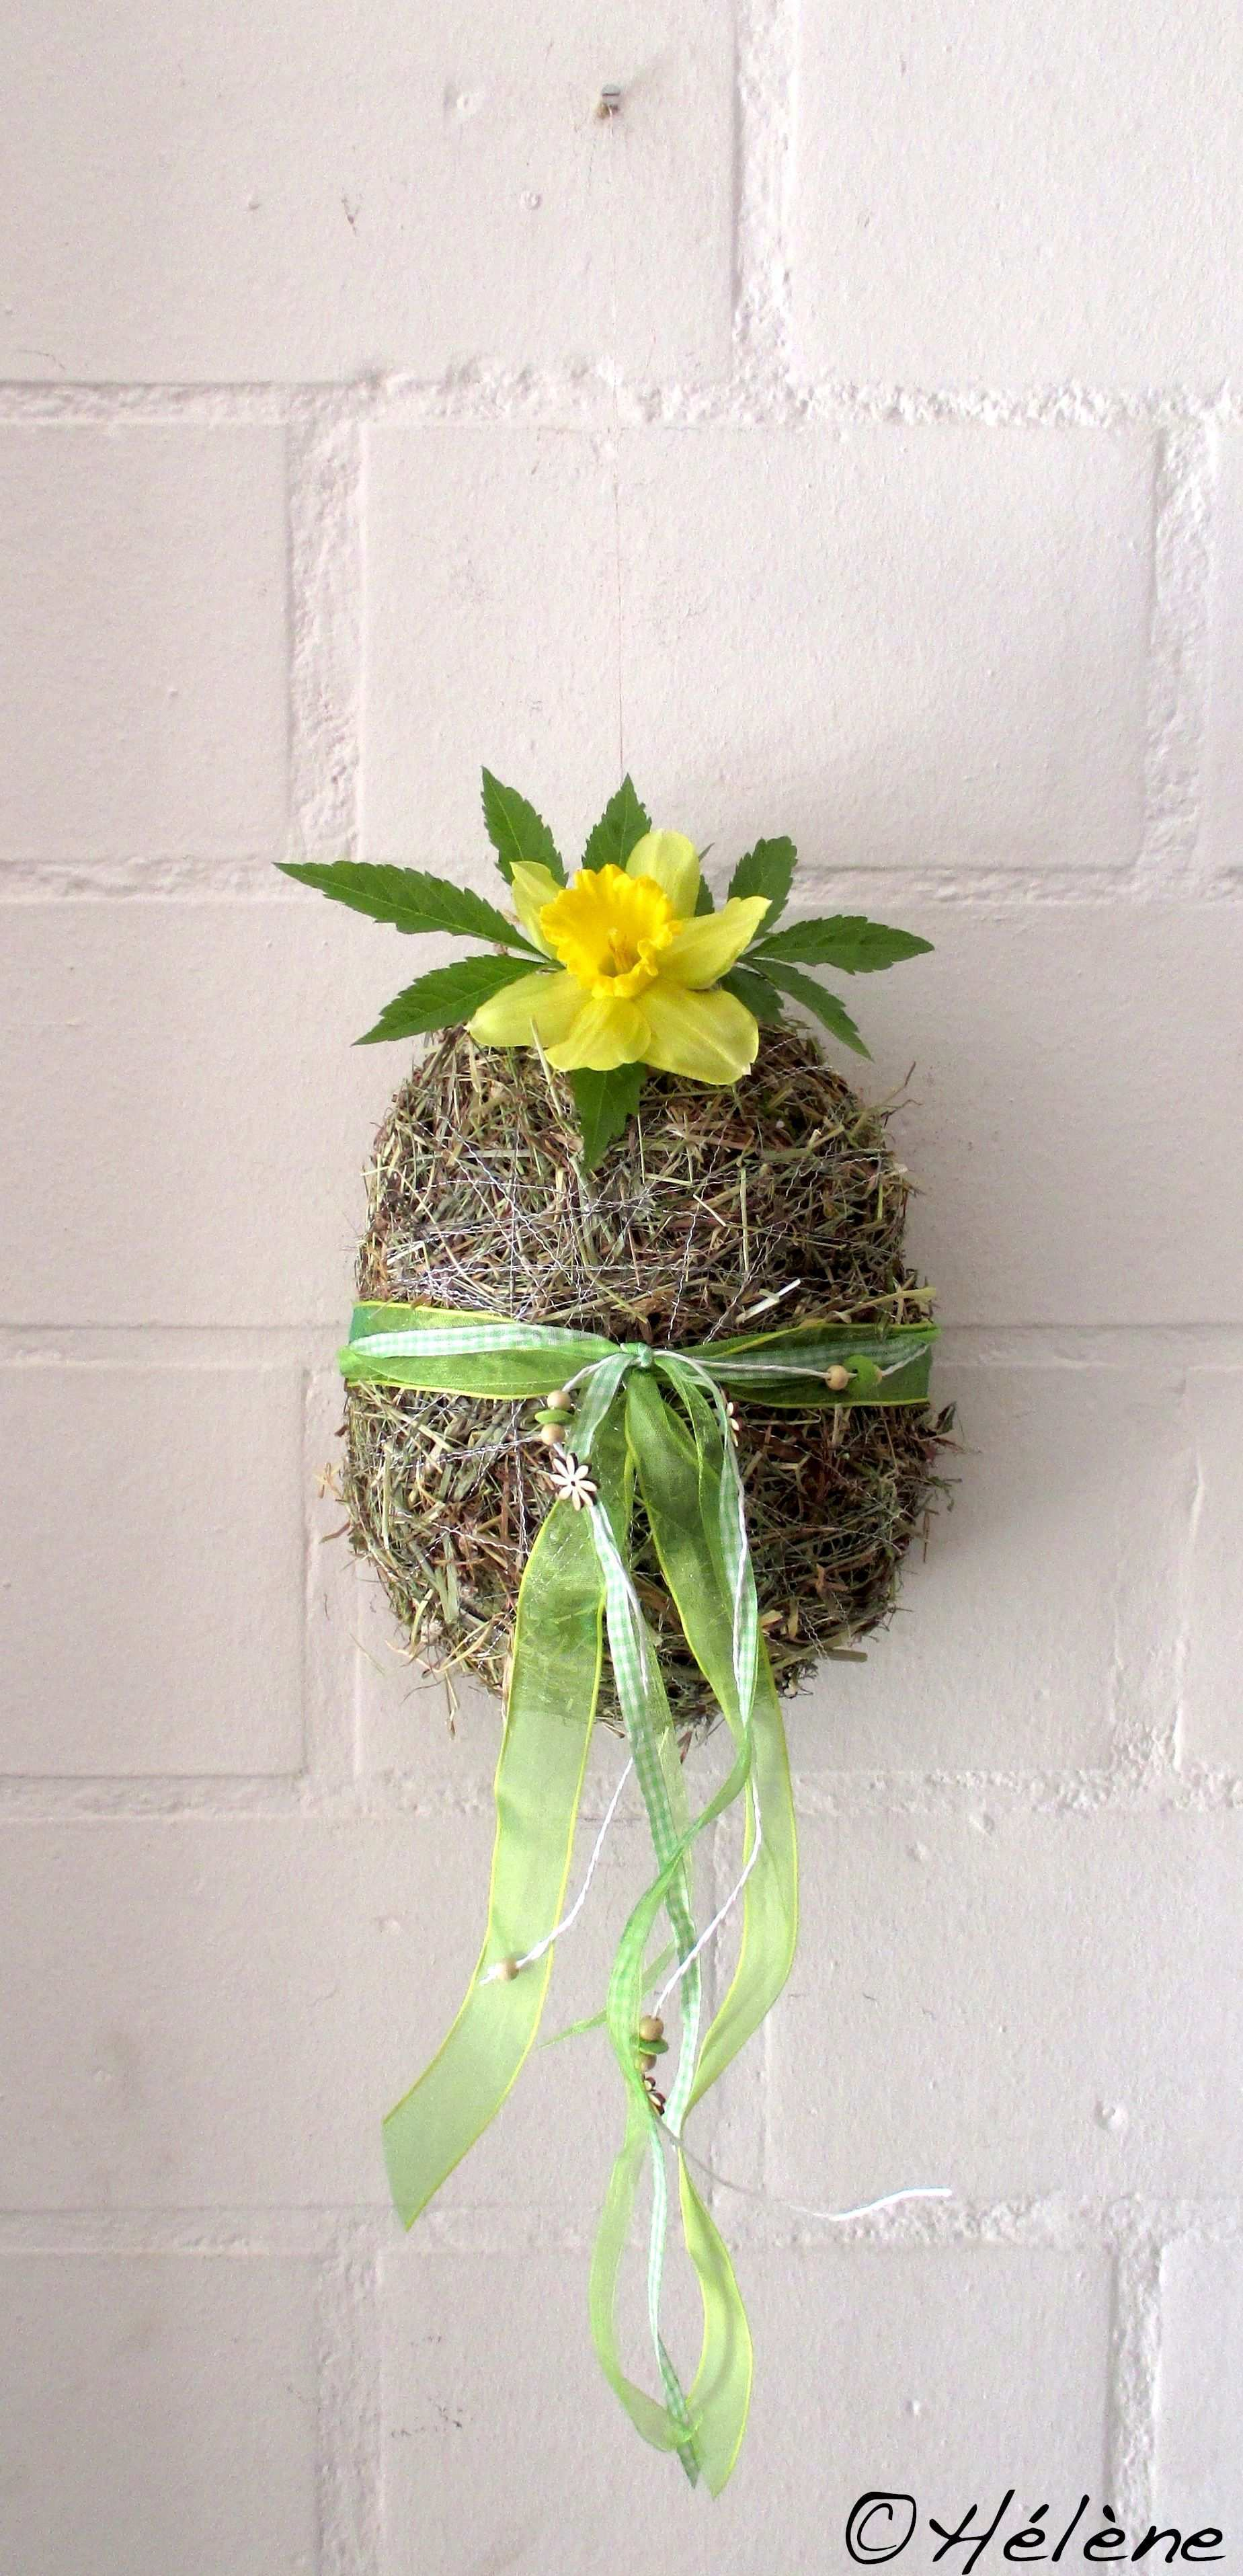 Ei Aus Heu Osternest Basteln Bastelideen Ostern Ostern 2017